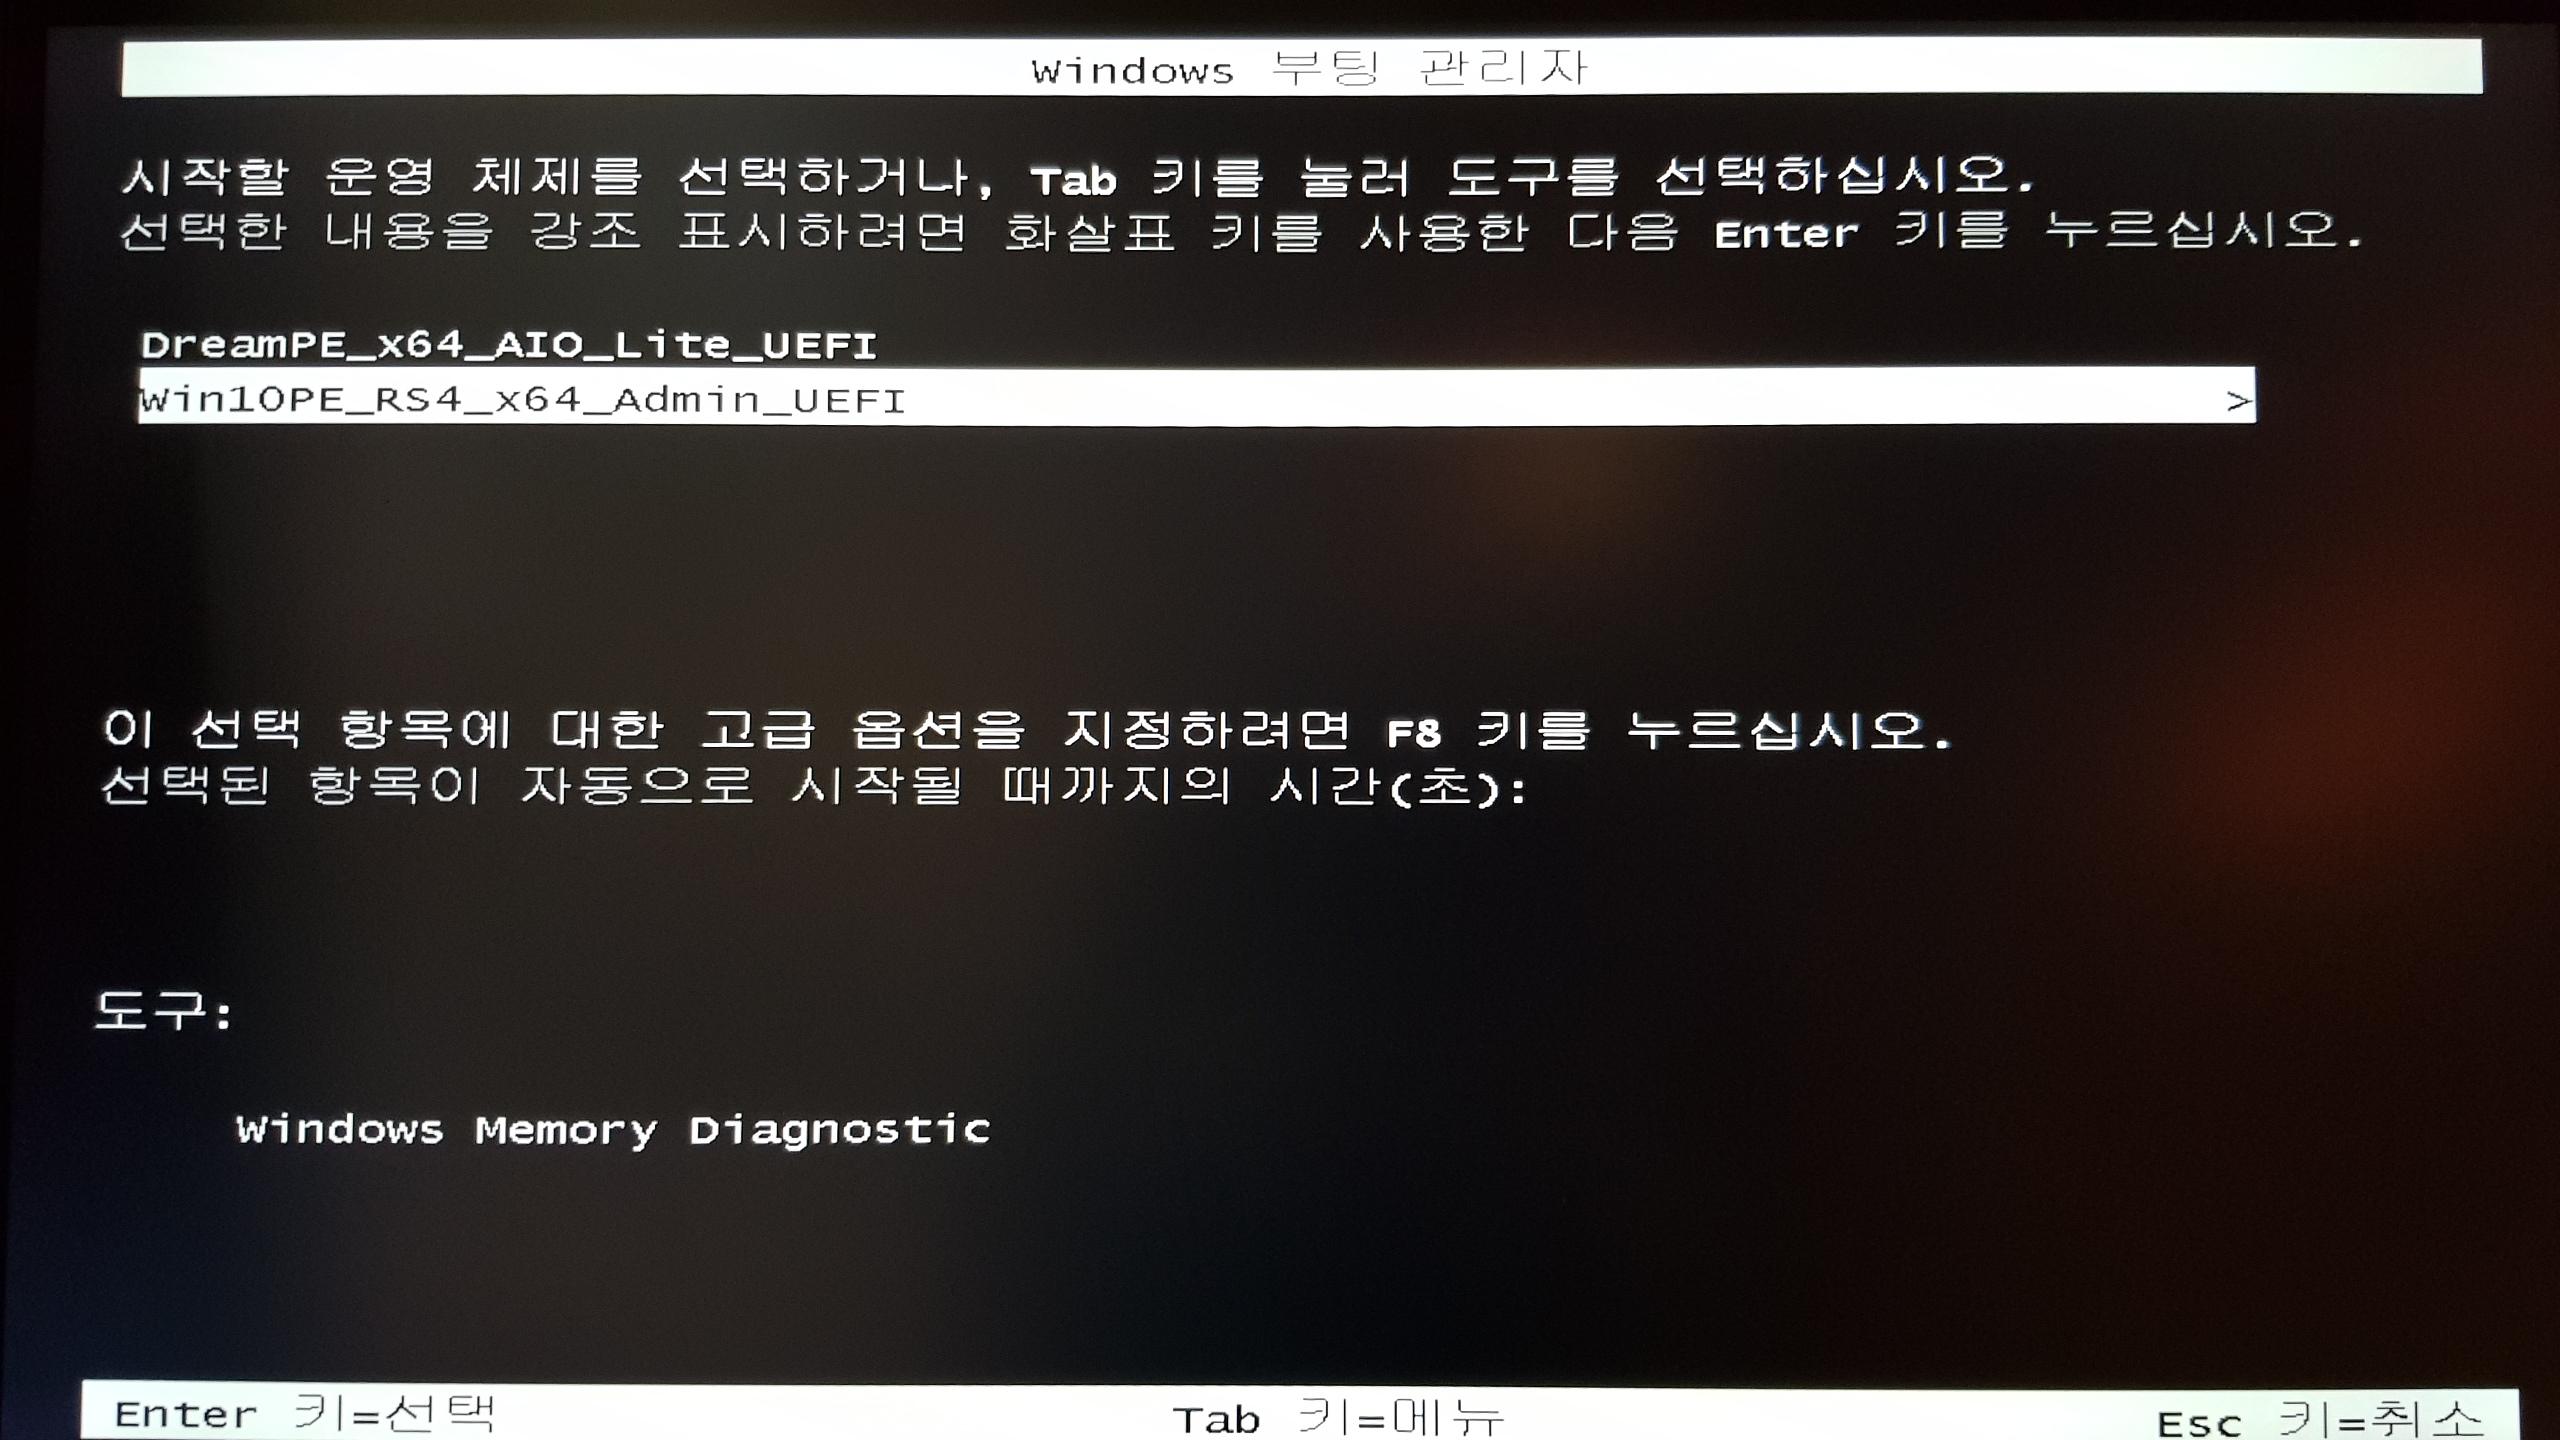 UEFI 부팅 시 선택화면.jpg